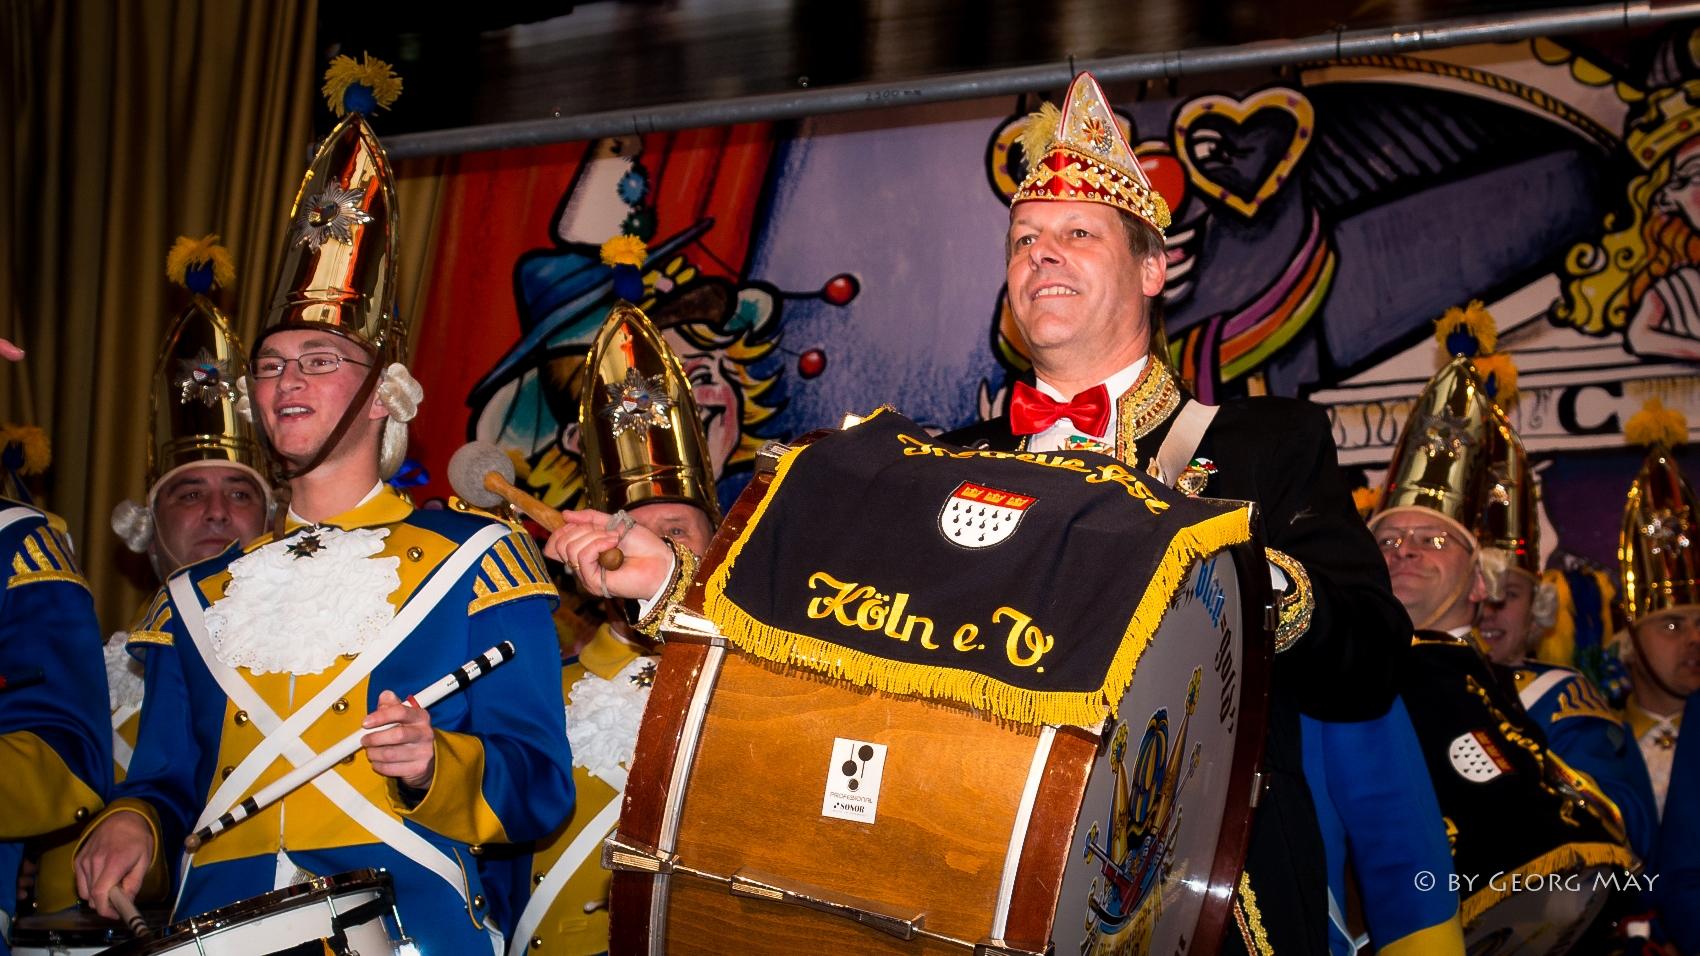 Markus Ritterbach - langjähriger Präsident des Festkomittes Kölner Karneval